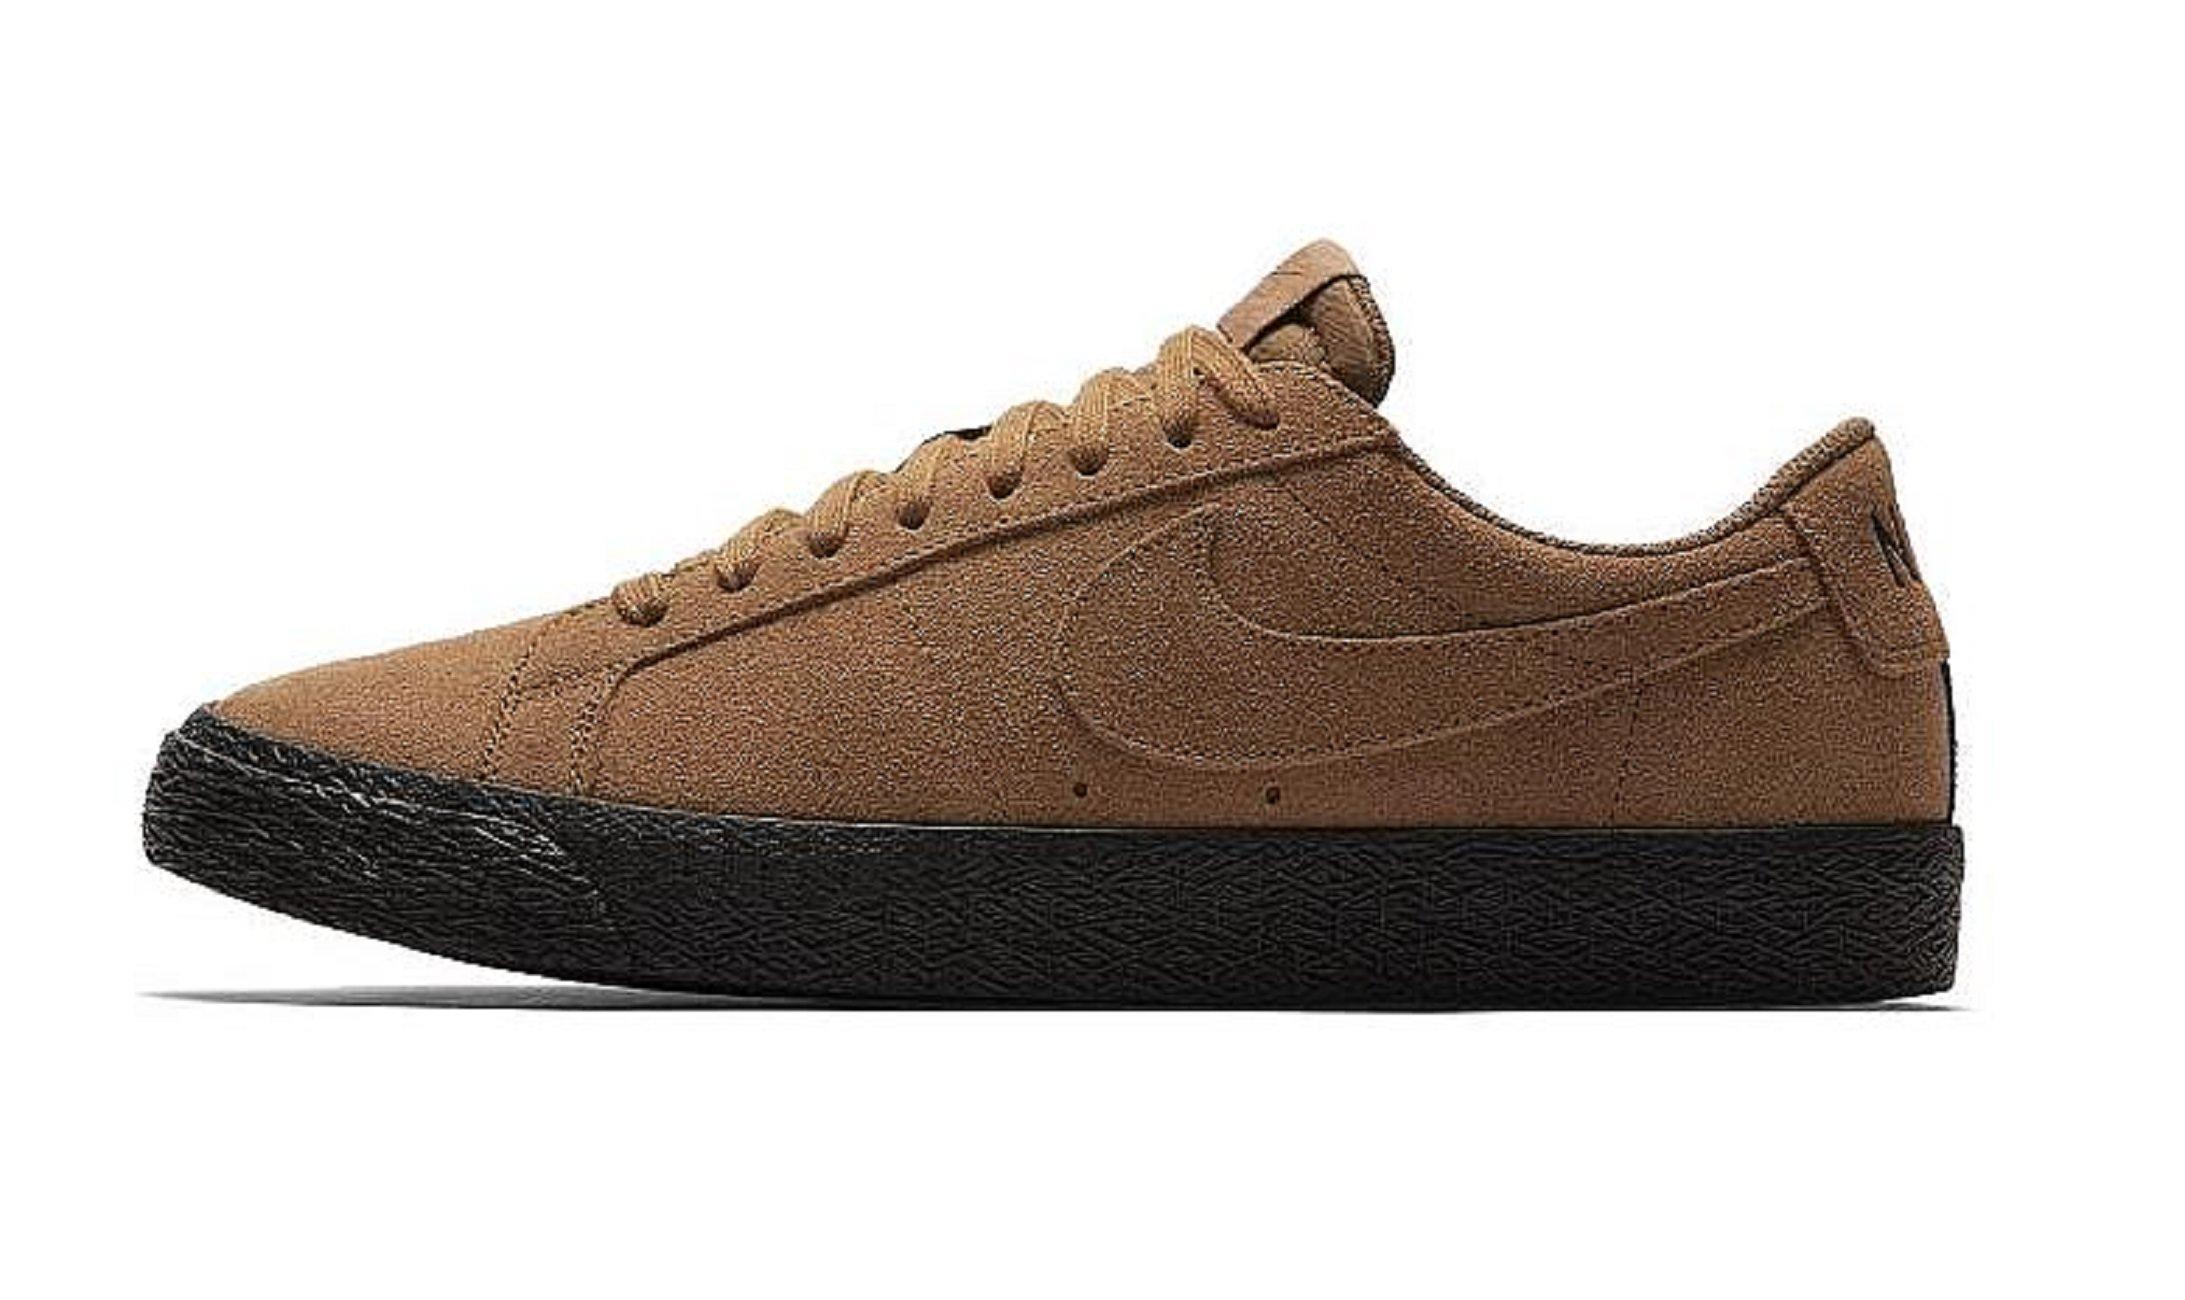 NIKE SB Zoom Blazer Low Mens Fashion-Sneakers 864347-200_9.5 - LT British TAN/LT British TAN-Black